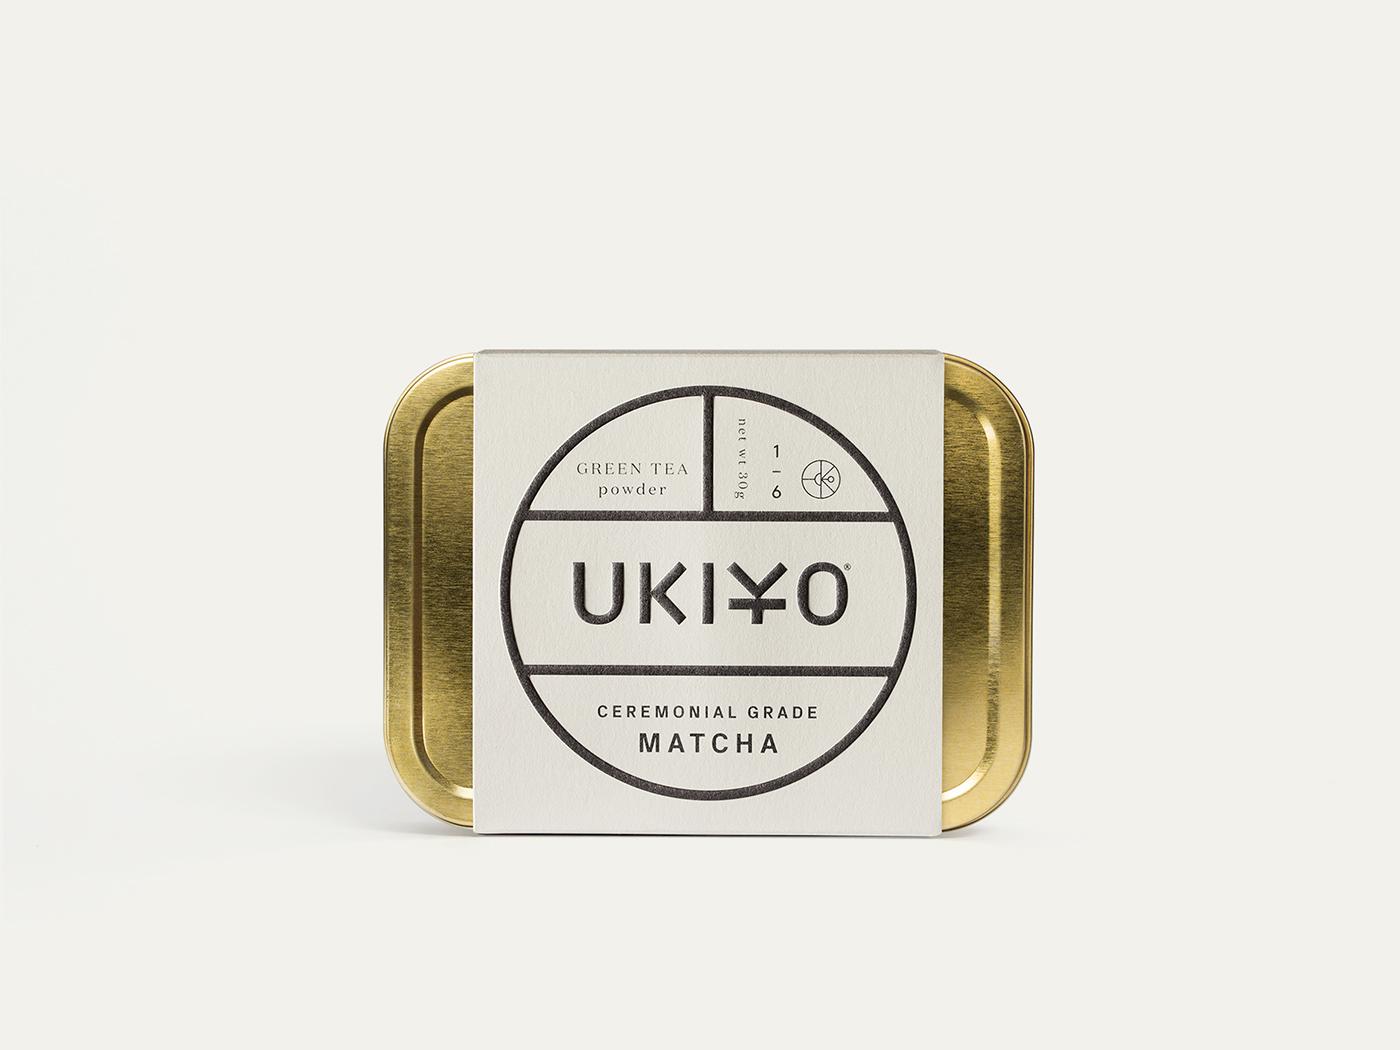 UKIYO Matcha Tea,Tea Packaging,Packaging,iwant,branding ,tea design,packaging art direction,matcha